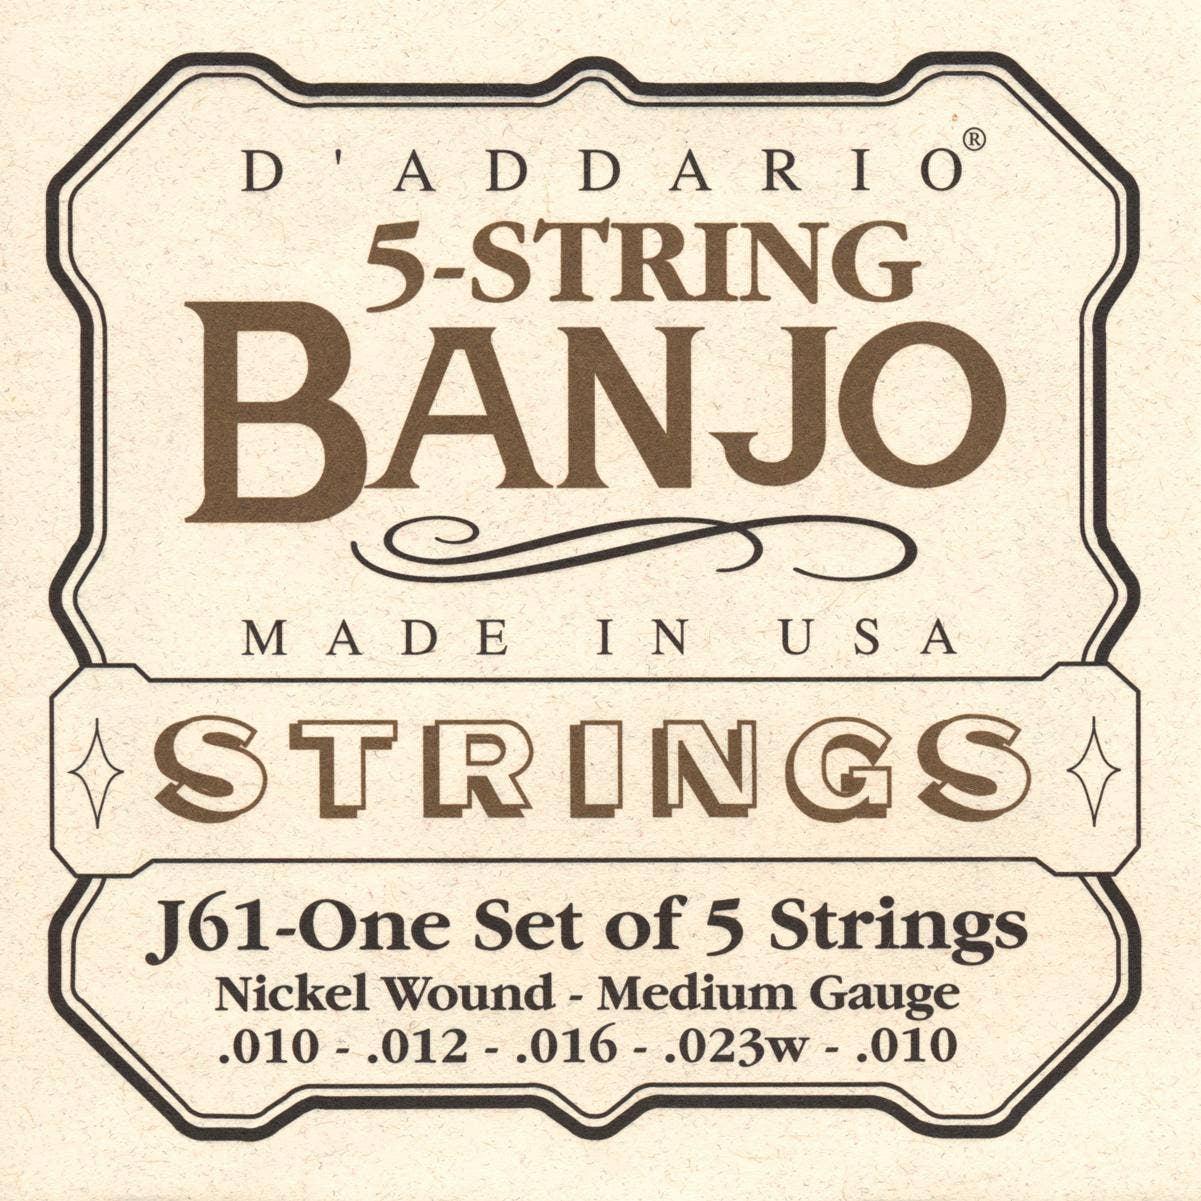 D'Addario J61 Medium Nickel 5 String Set Banjo Strings (10-23) for sale